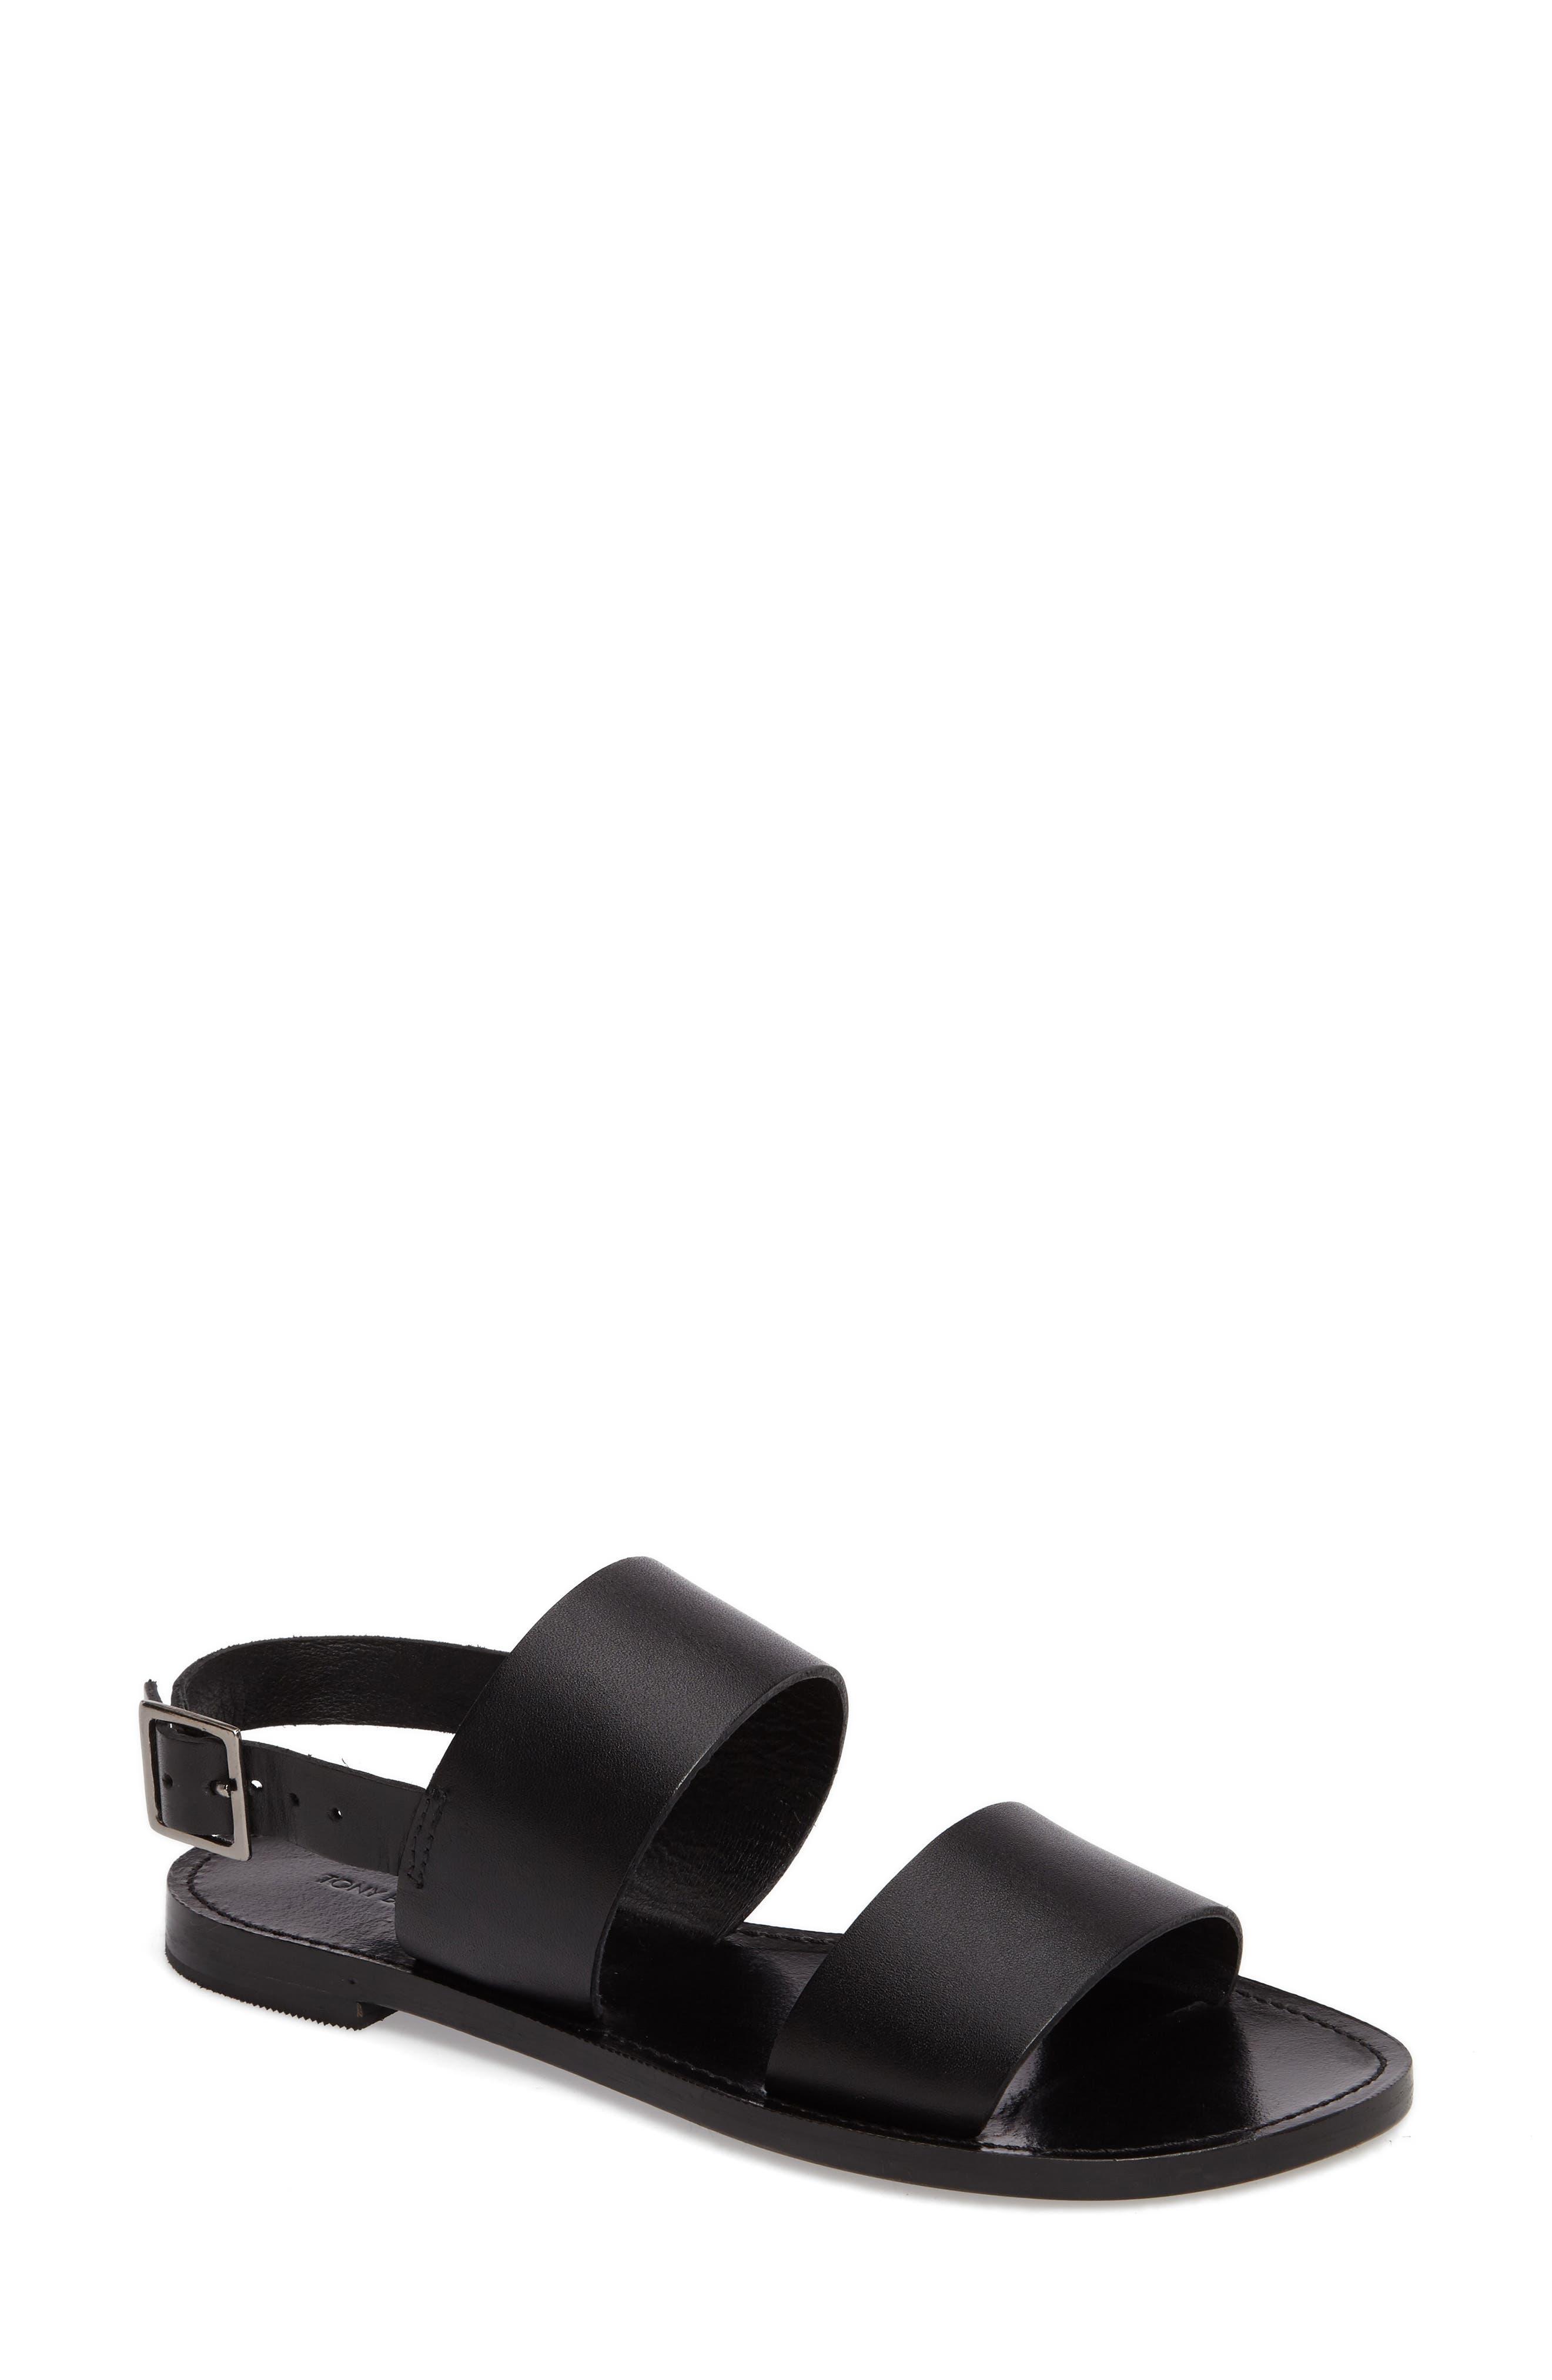 Filante Slingback Sandal,                         Main,                         color, 001